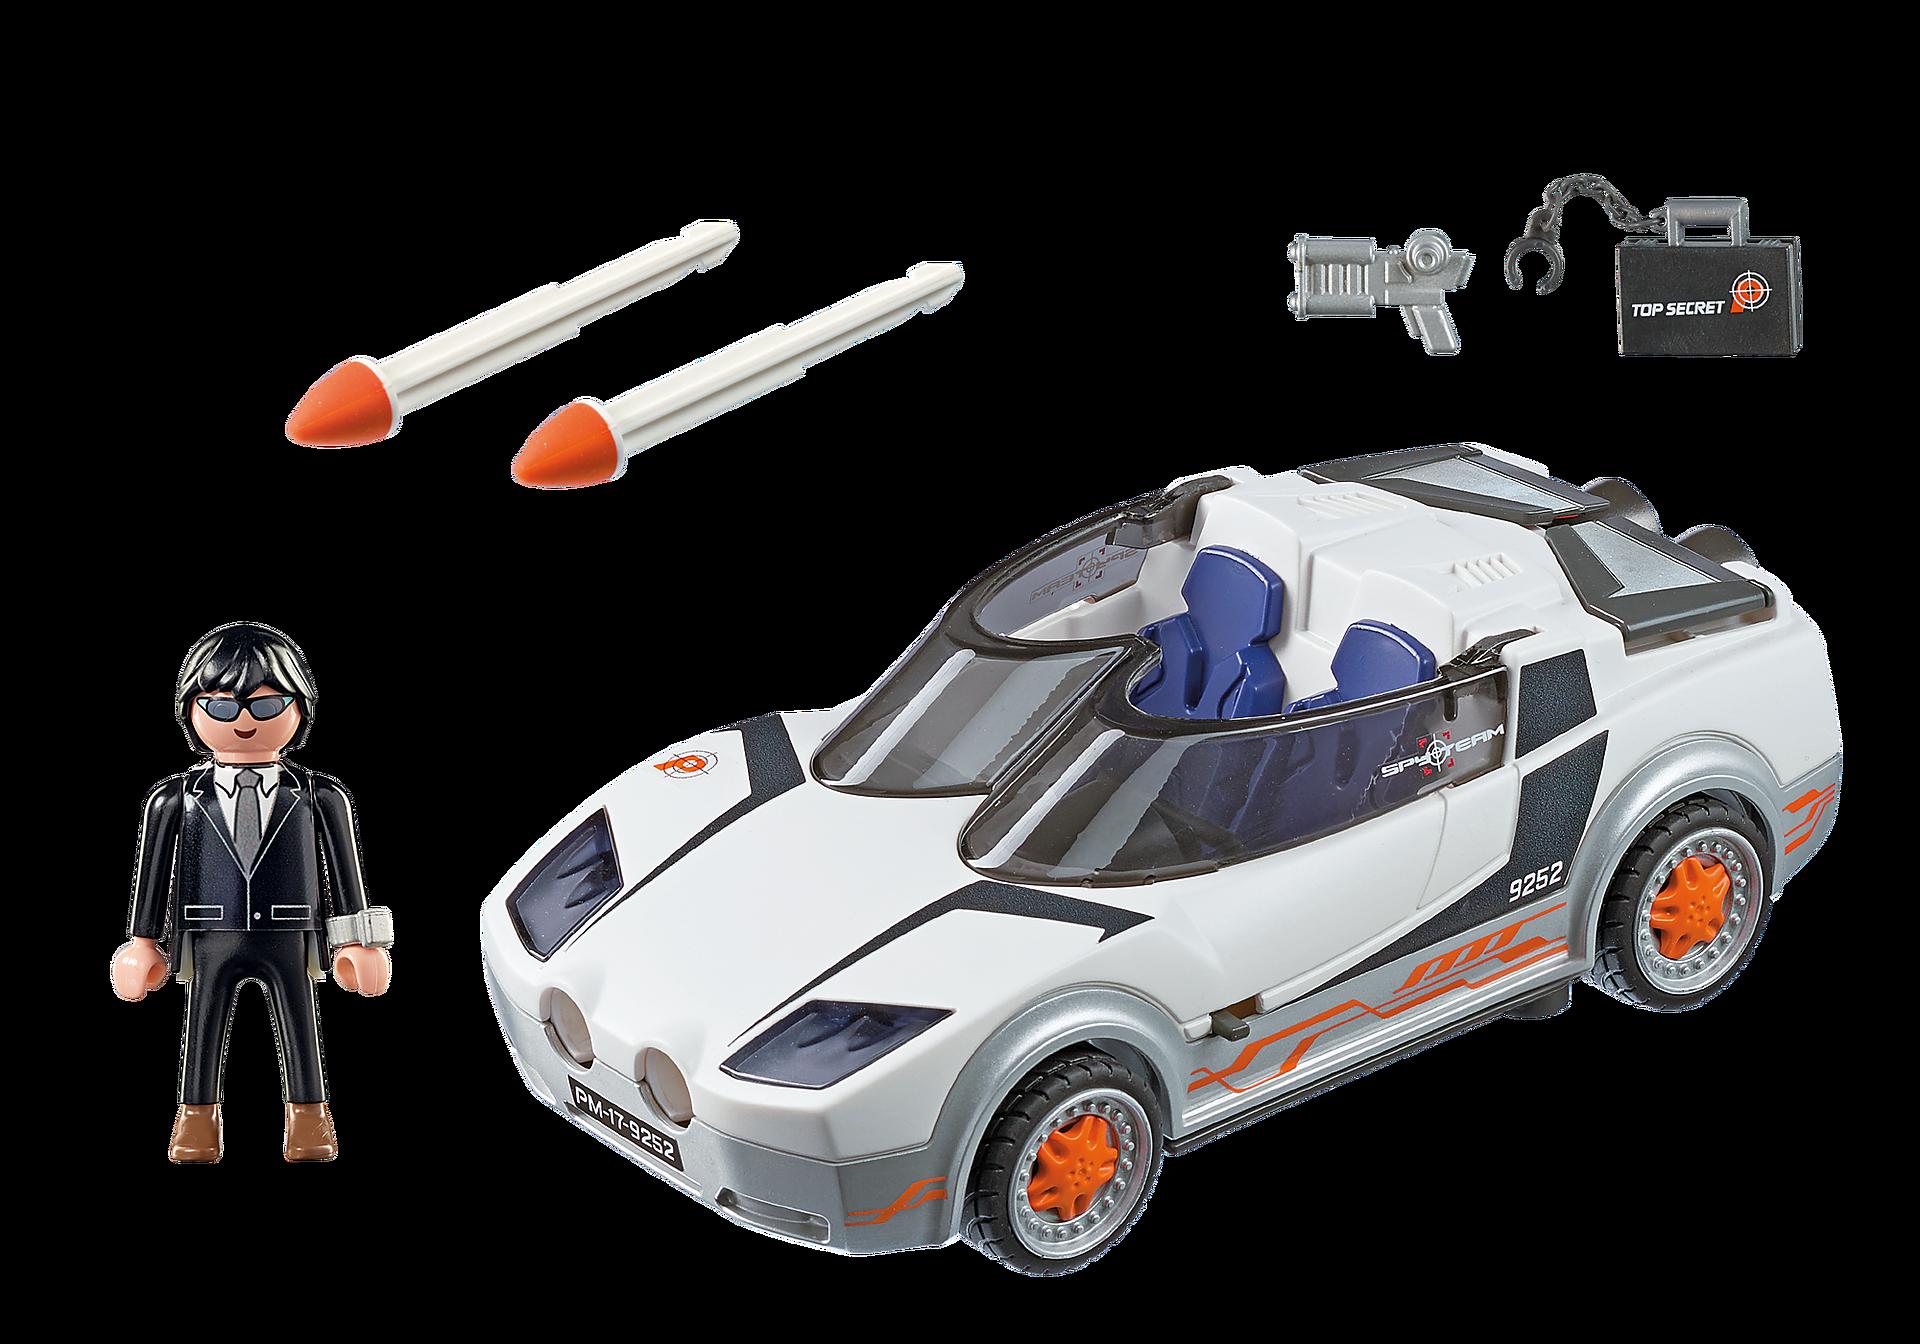 http://media.playmobil.com/i/playmobil/9252_product_box_back/Agent P.'s Spy Racer